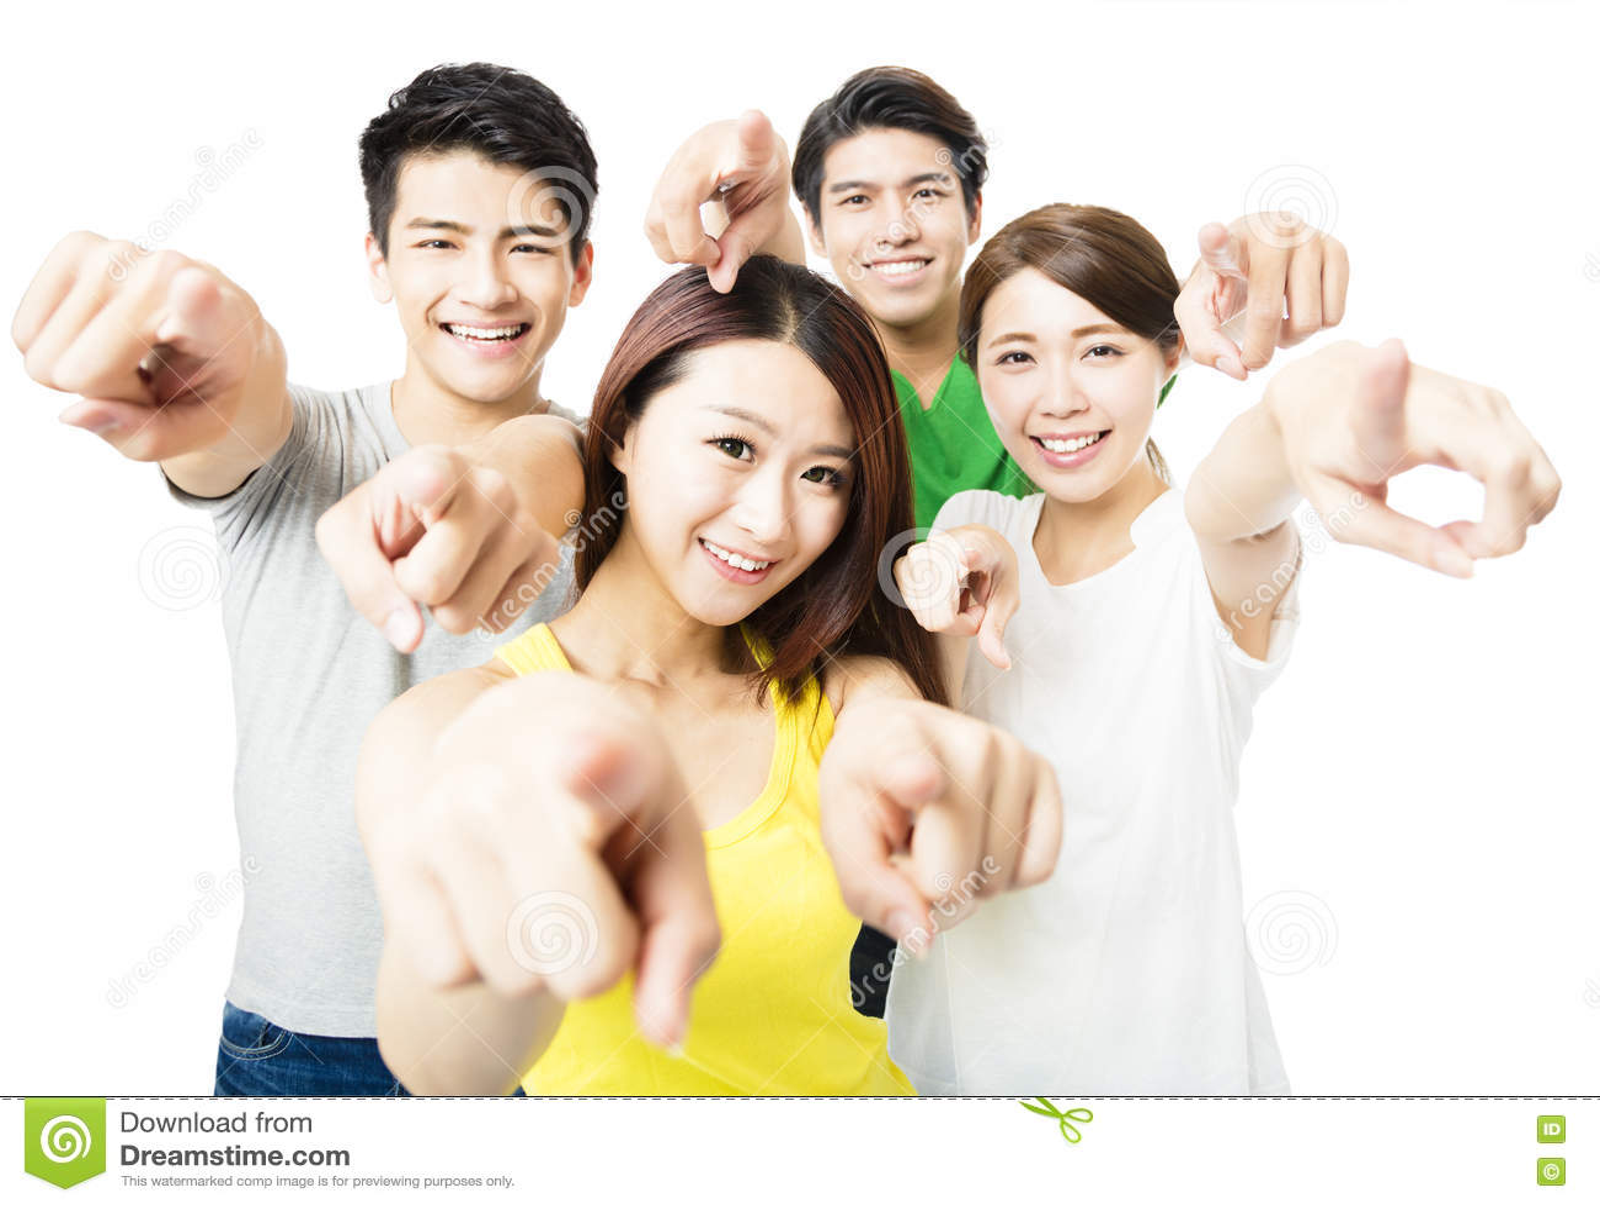 Stående av upphetsat ungt studentfolk som pekar på dig